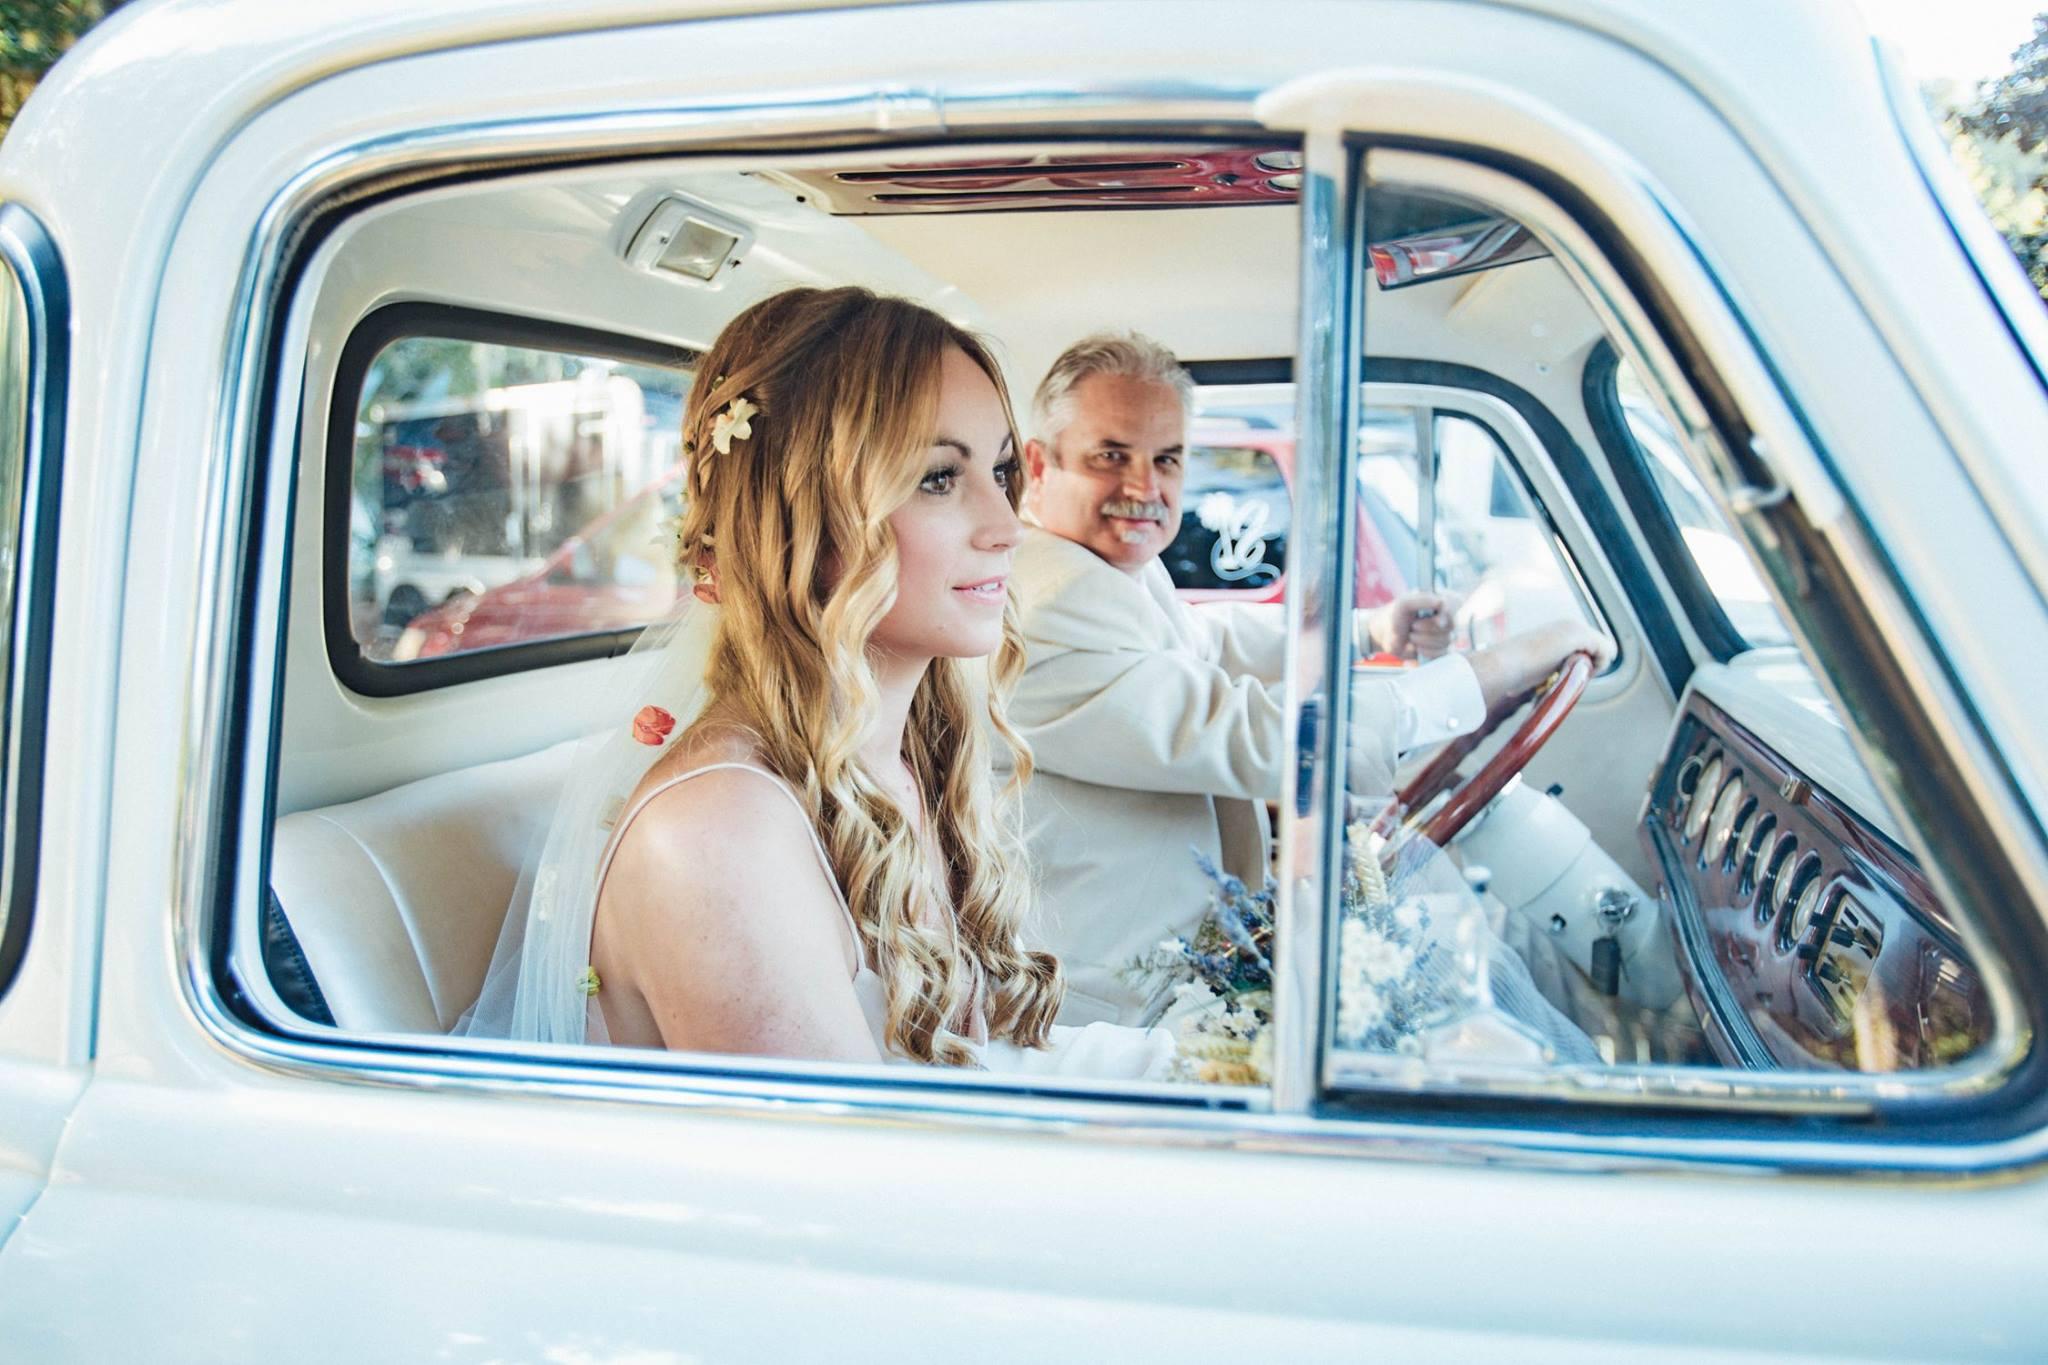 lindy-garvin-rebecca-schoneveld-vivian-sage-blush-wedding-dress-blush-bridal-gown-handmade-wedding-dress-ivory-and-beau-bridal-boutique-savannah-wedding-dresses-savannah-bridal-boutique-savannah-weddings-savannah-brides-jacksonville-bridal-boutique-9.jpg